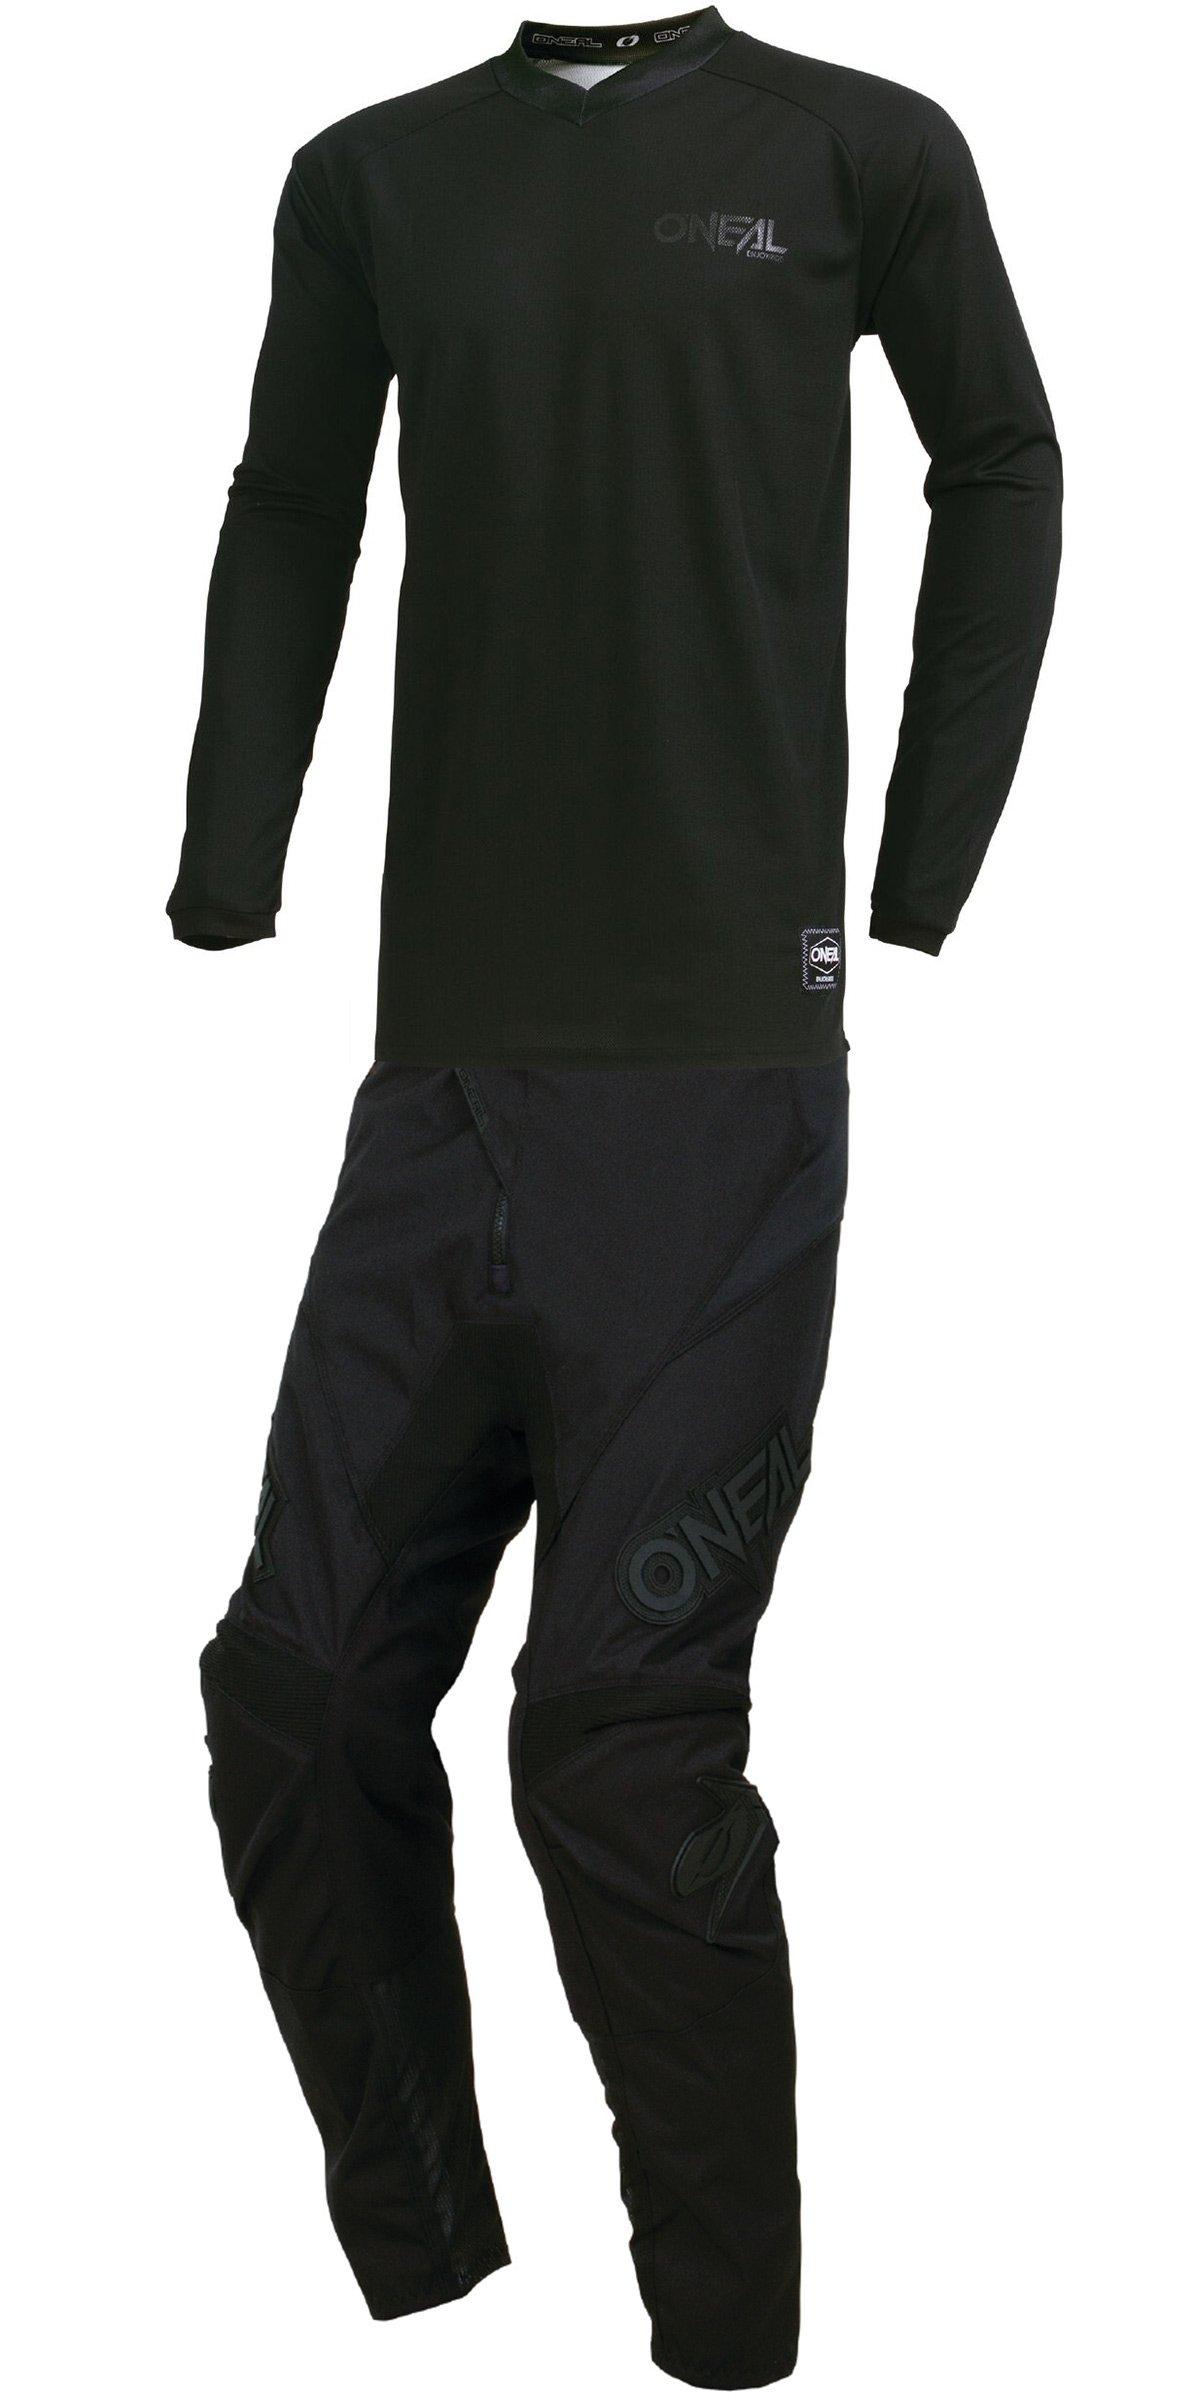 O'Neal - 2019 Element Classic (Mens Black Large/34W) MX Riding Gear Combo Set, Motocross Off-Road Dirt Bike Jersey & Lite Pant